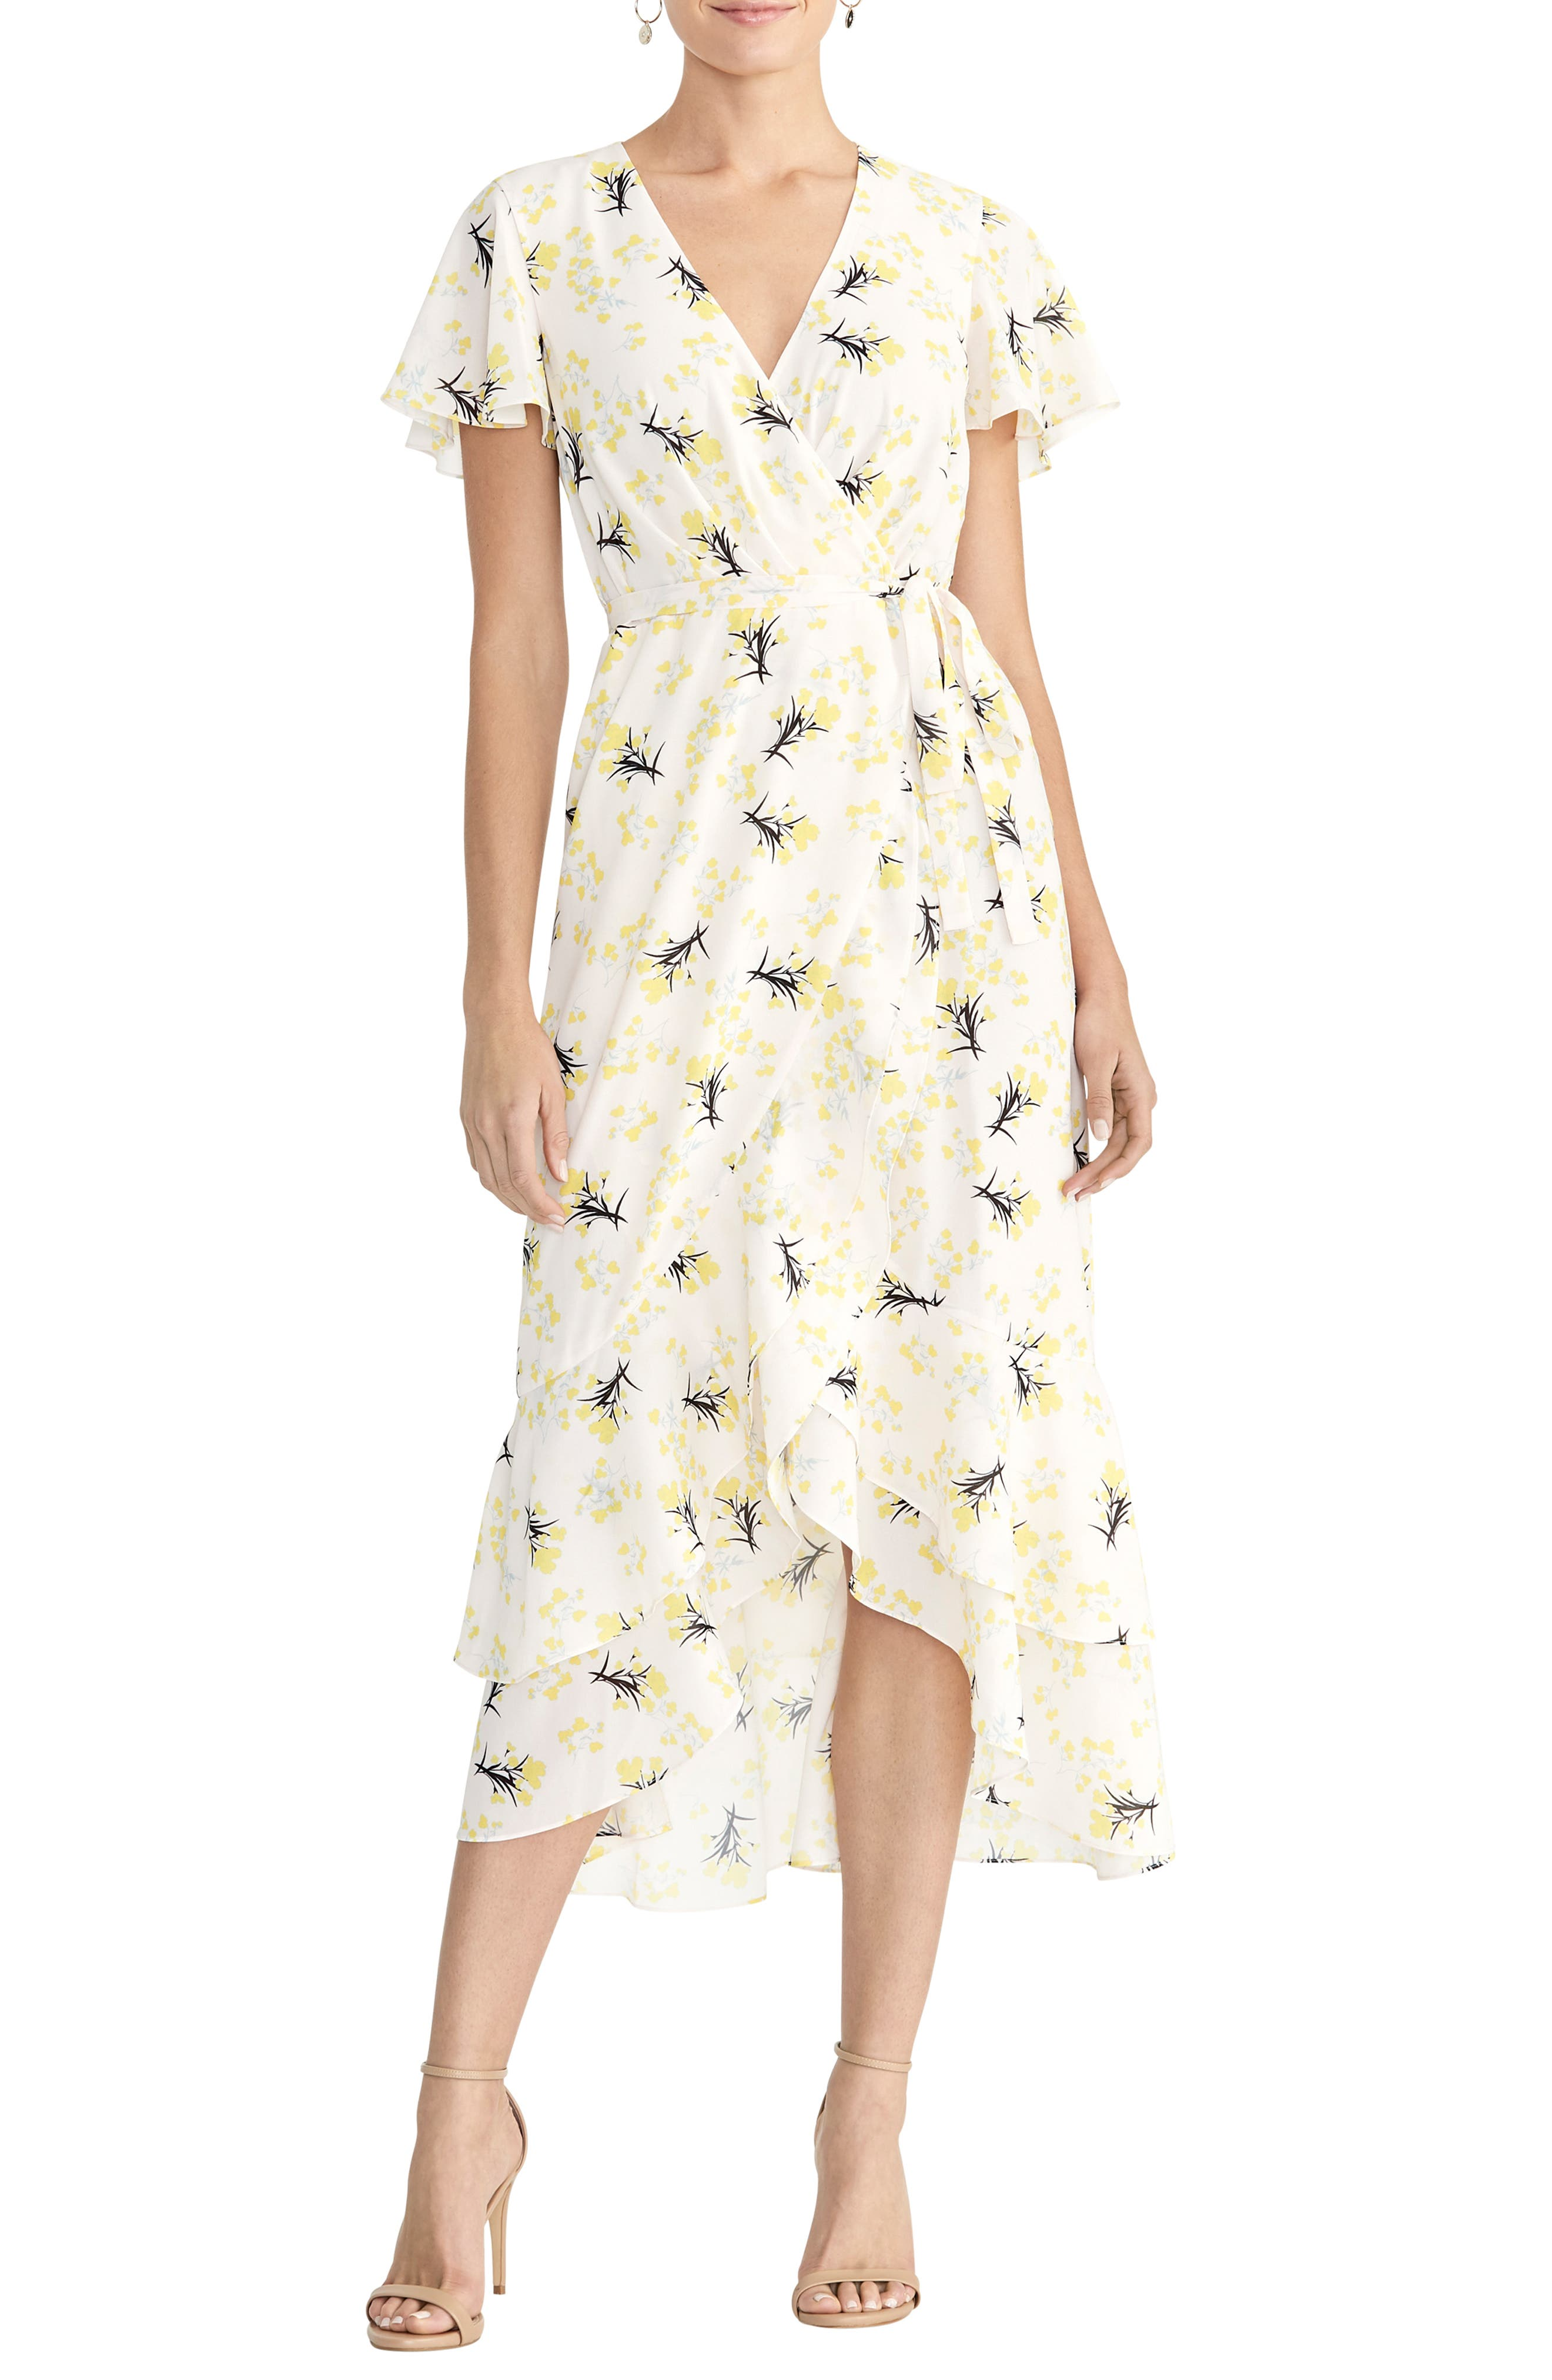 1930s Day Dresses, Afternoon Dresses History Womens Rachel Rachel Roy Faux Wrap Midi Dress $149.00 AT vintagedancer.com